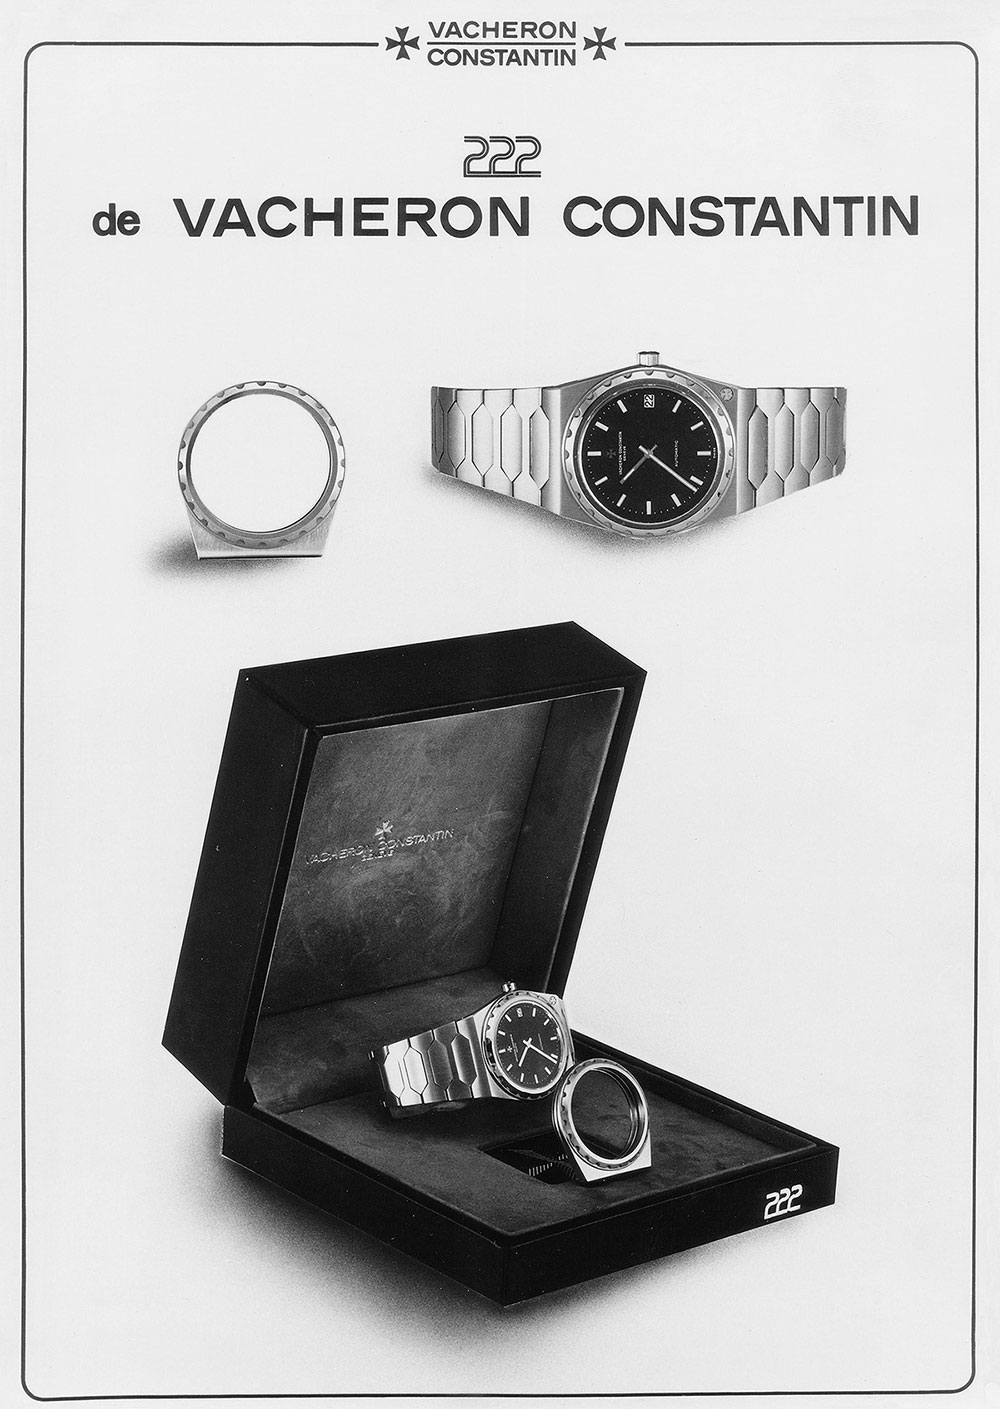 Vacheron Constantin 222